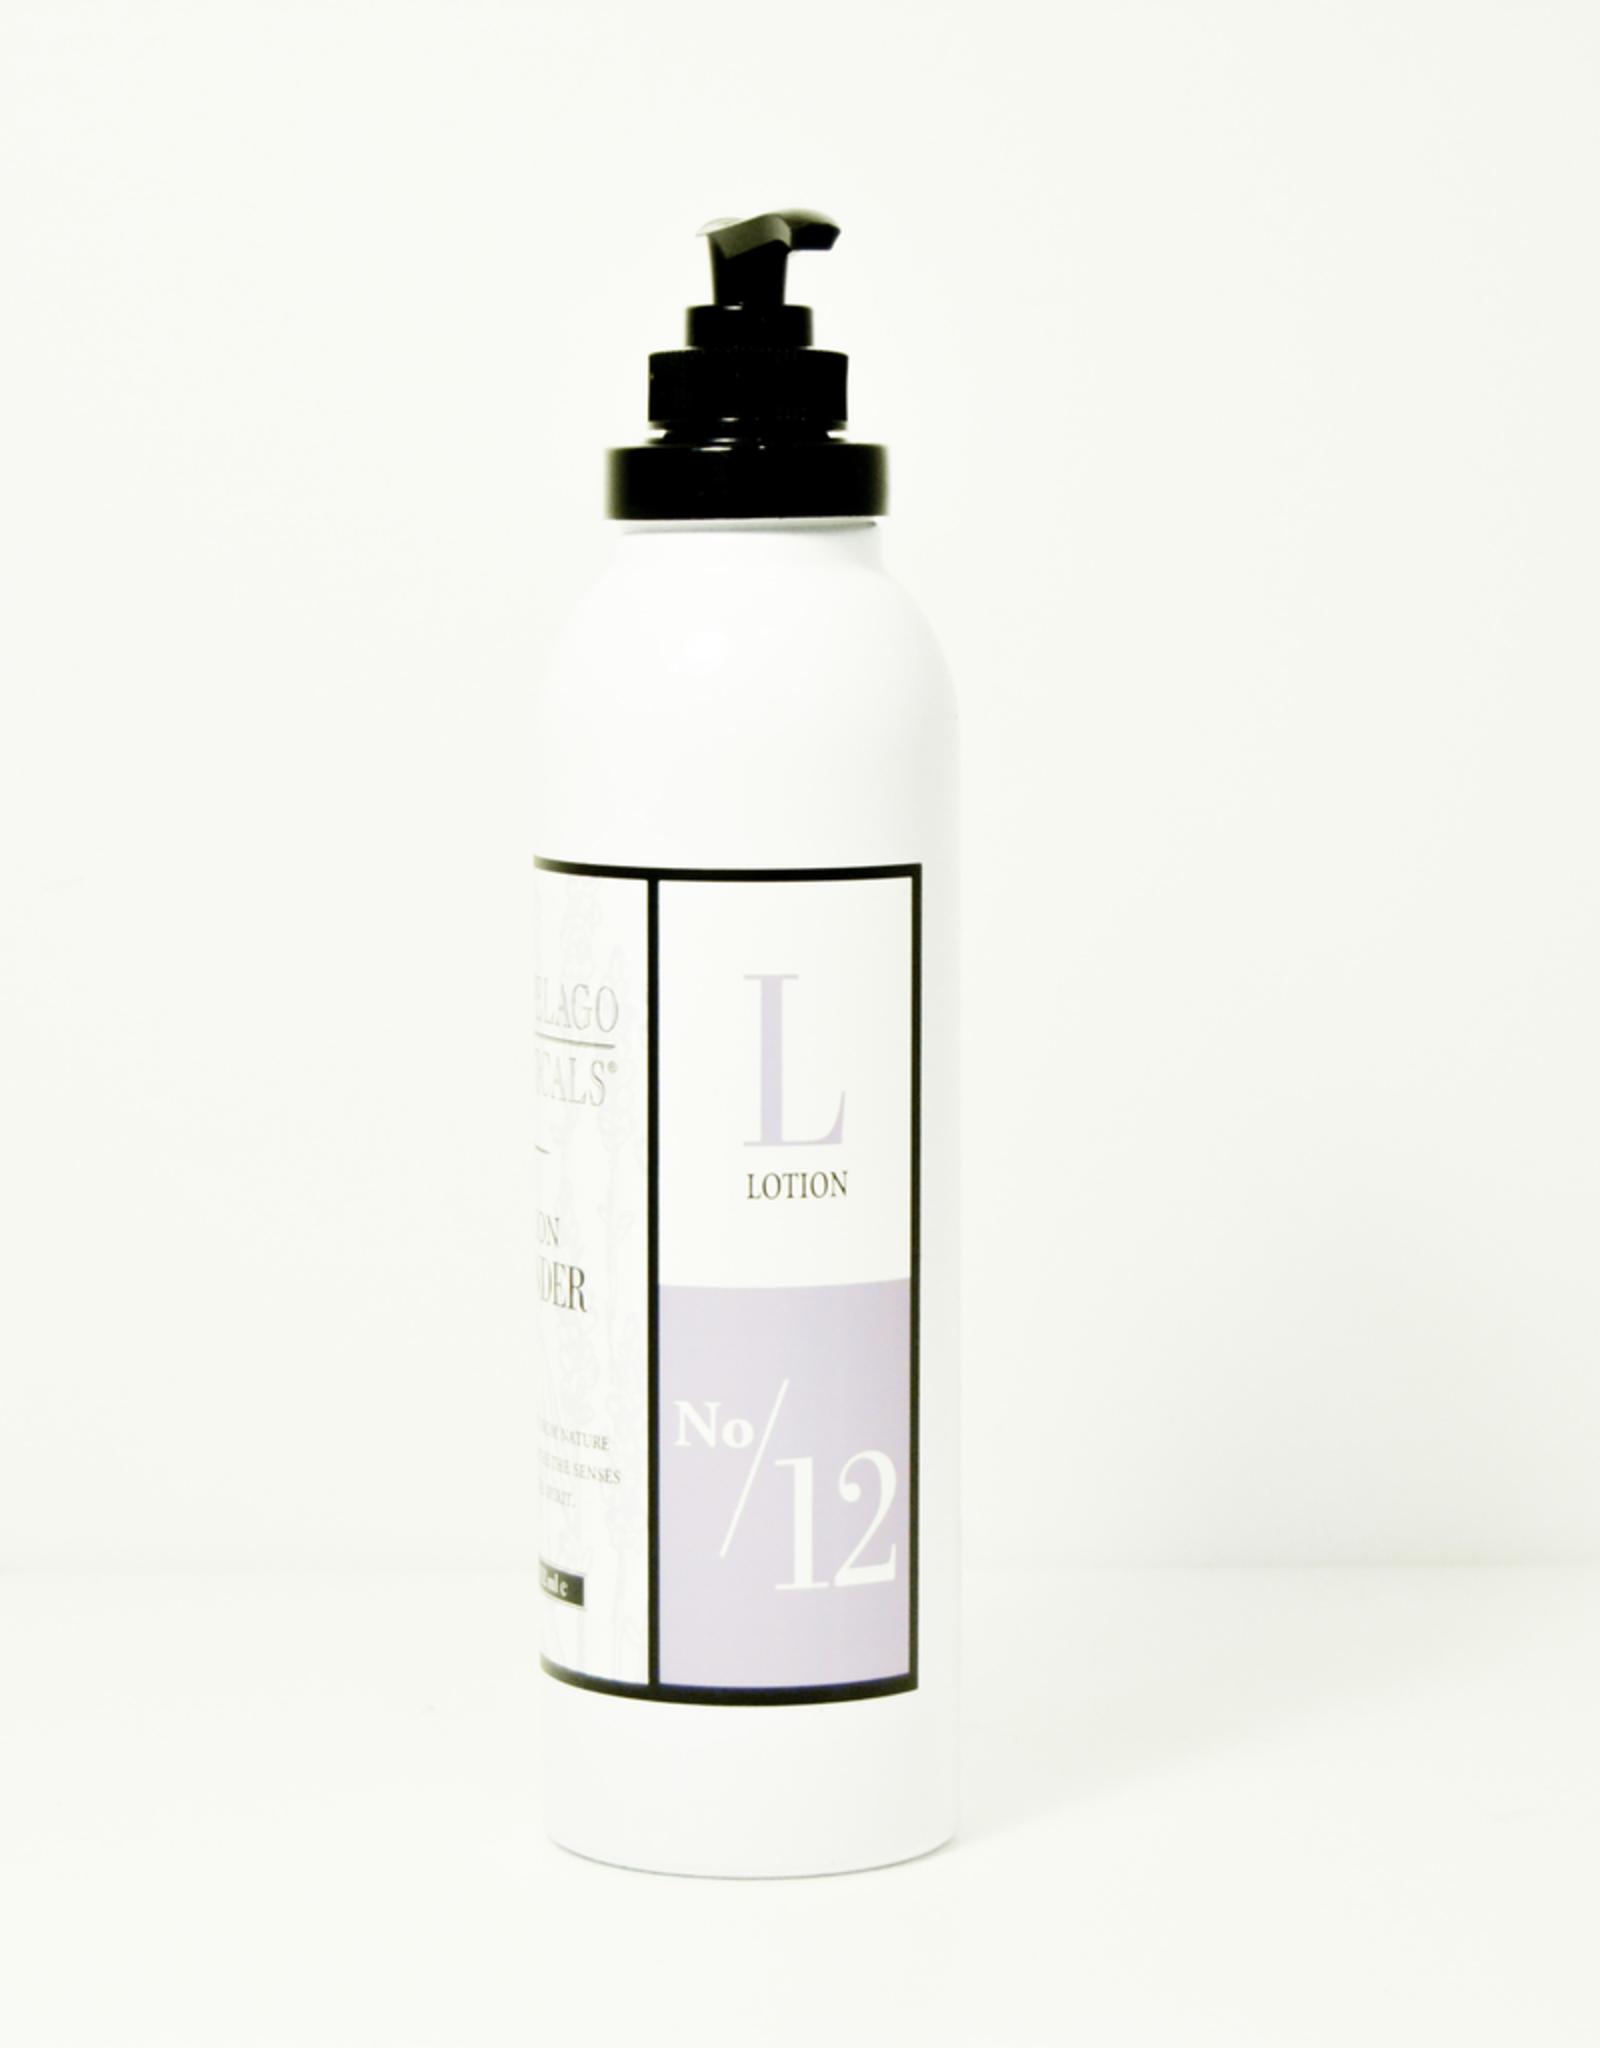 18oz Lavender Lotion